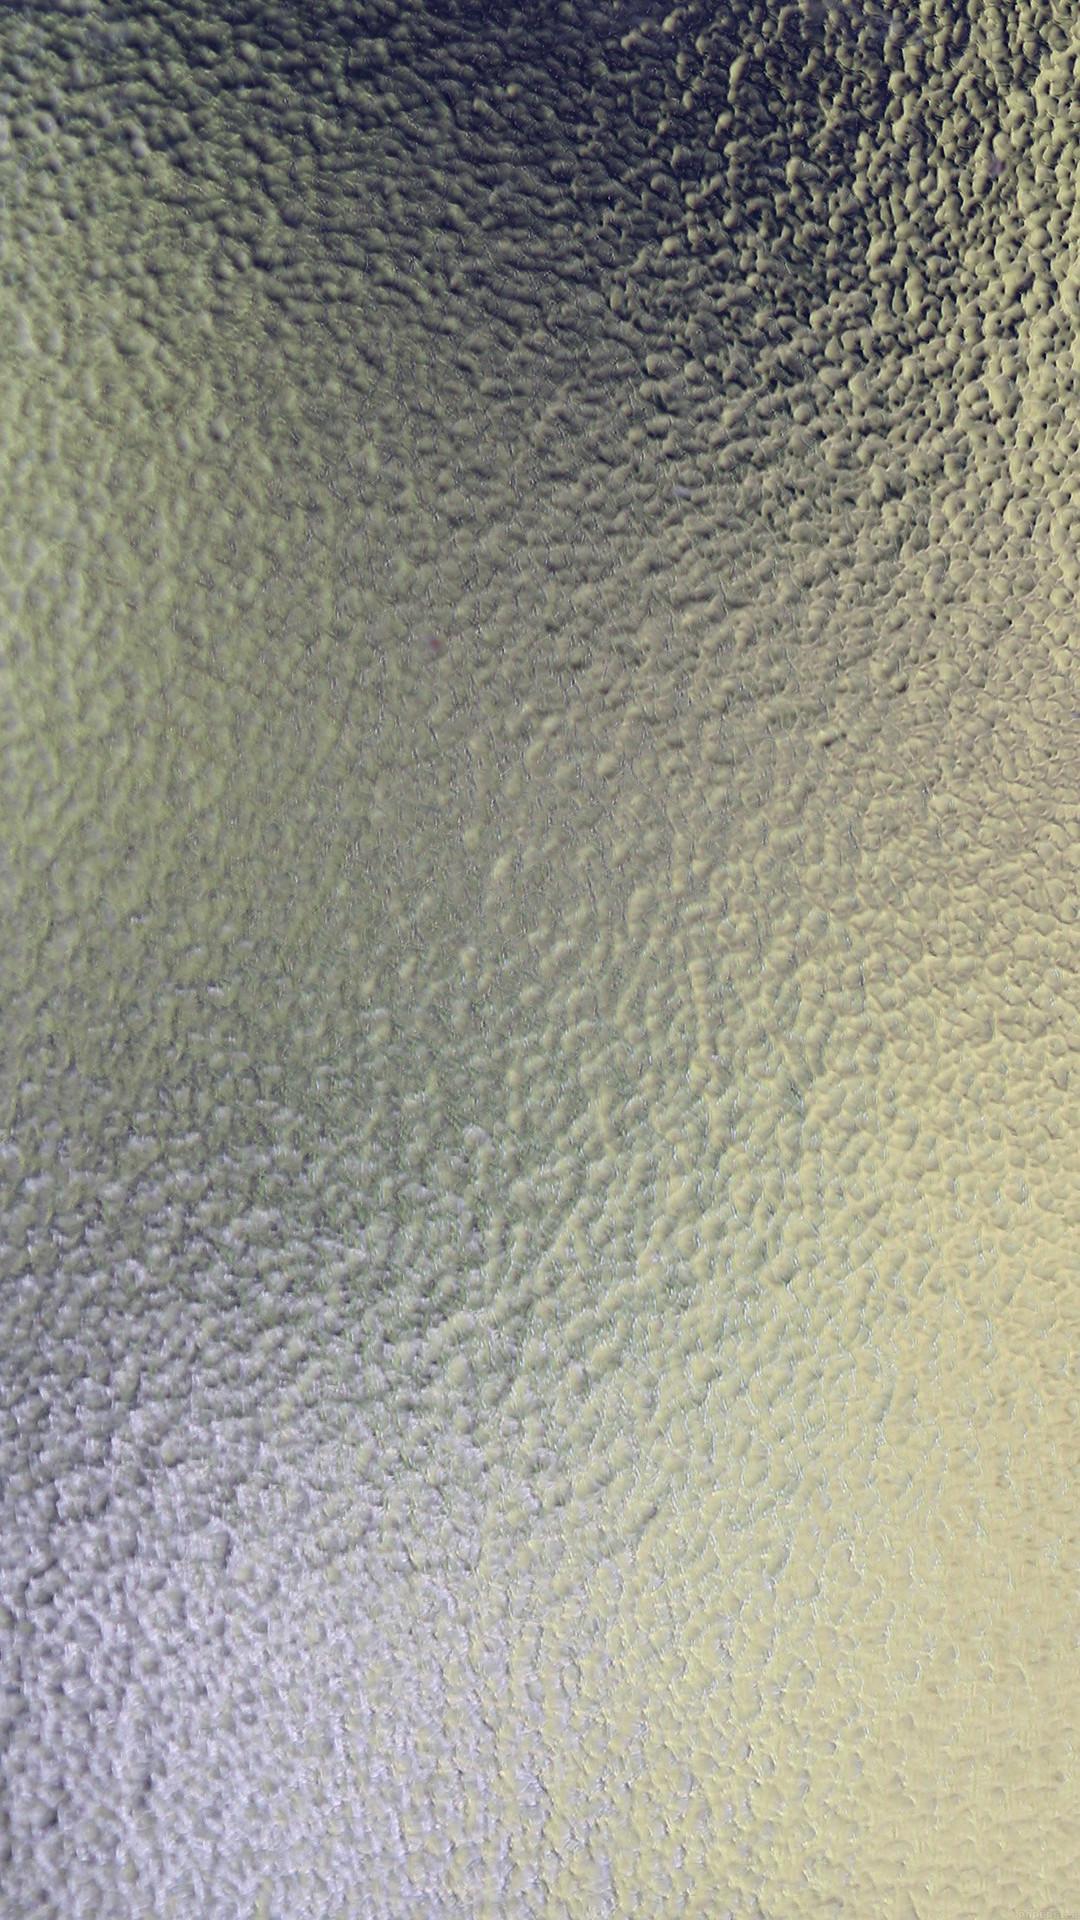 Window Glass Wave Texture Blue Patterns #iPhone #7 #wallpaper